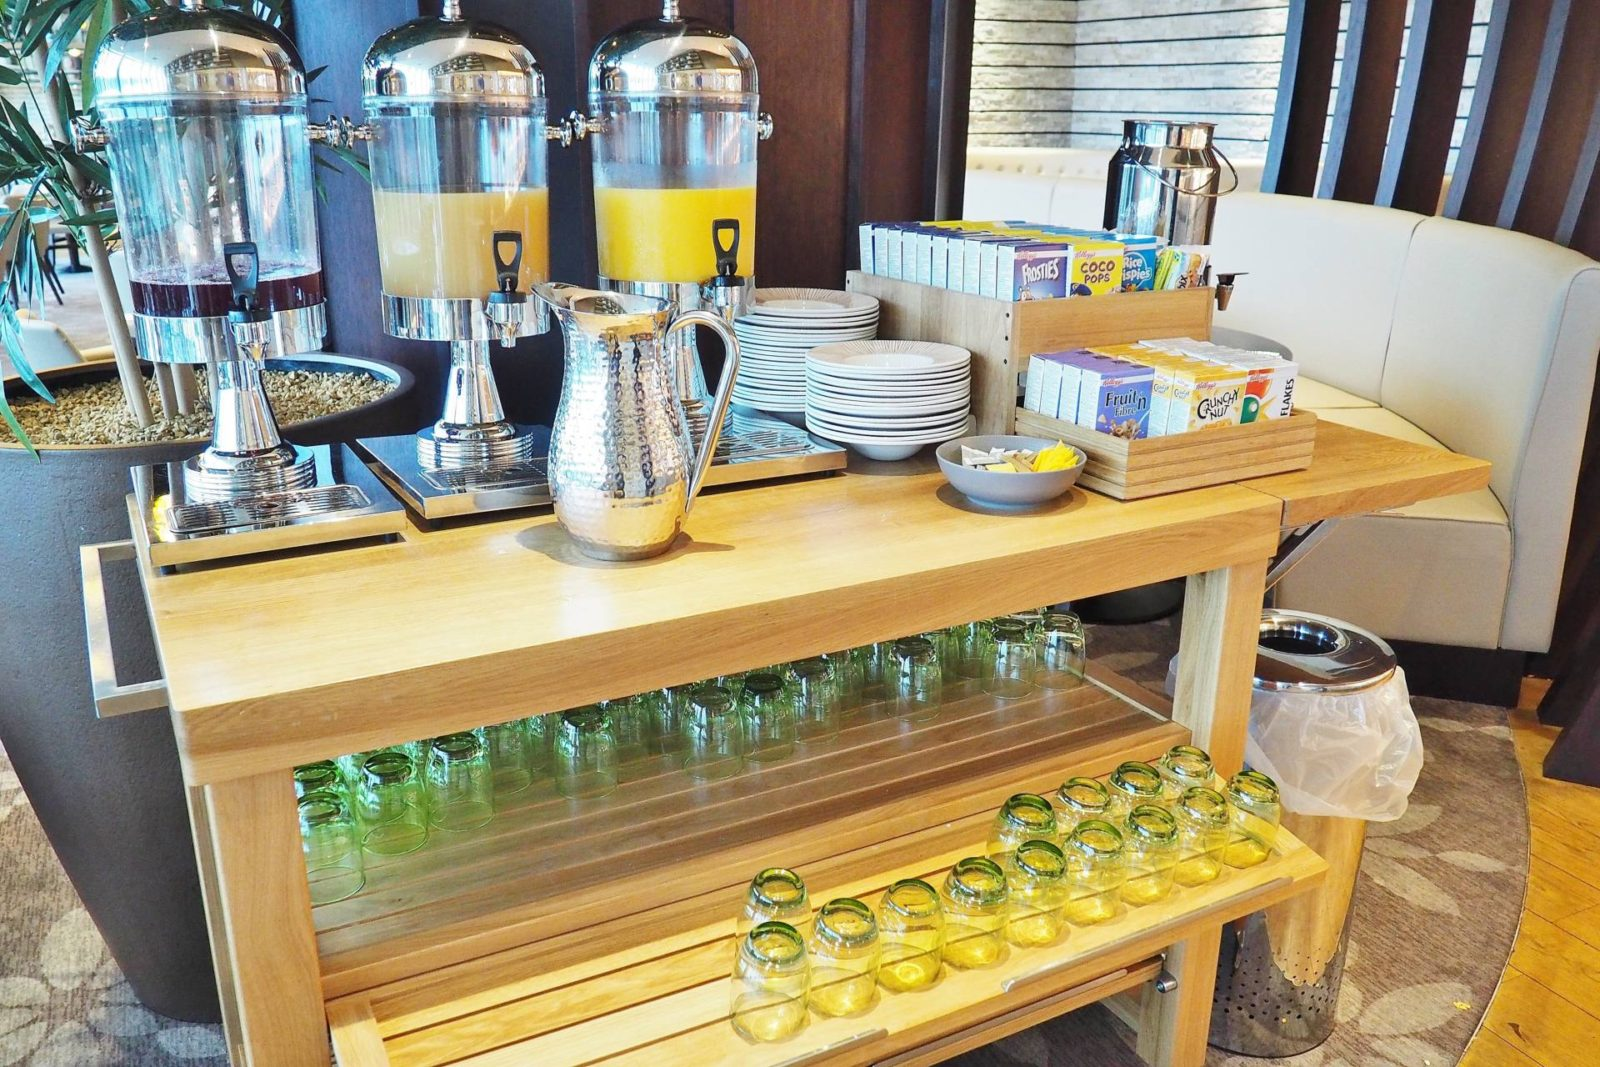 Genting Hotel Juice Bar